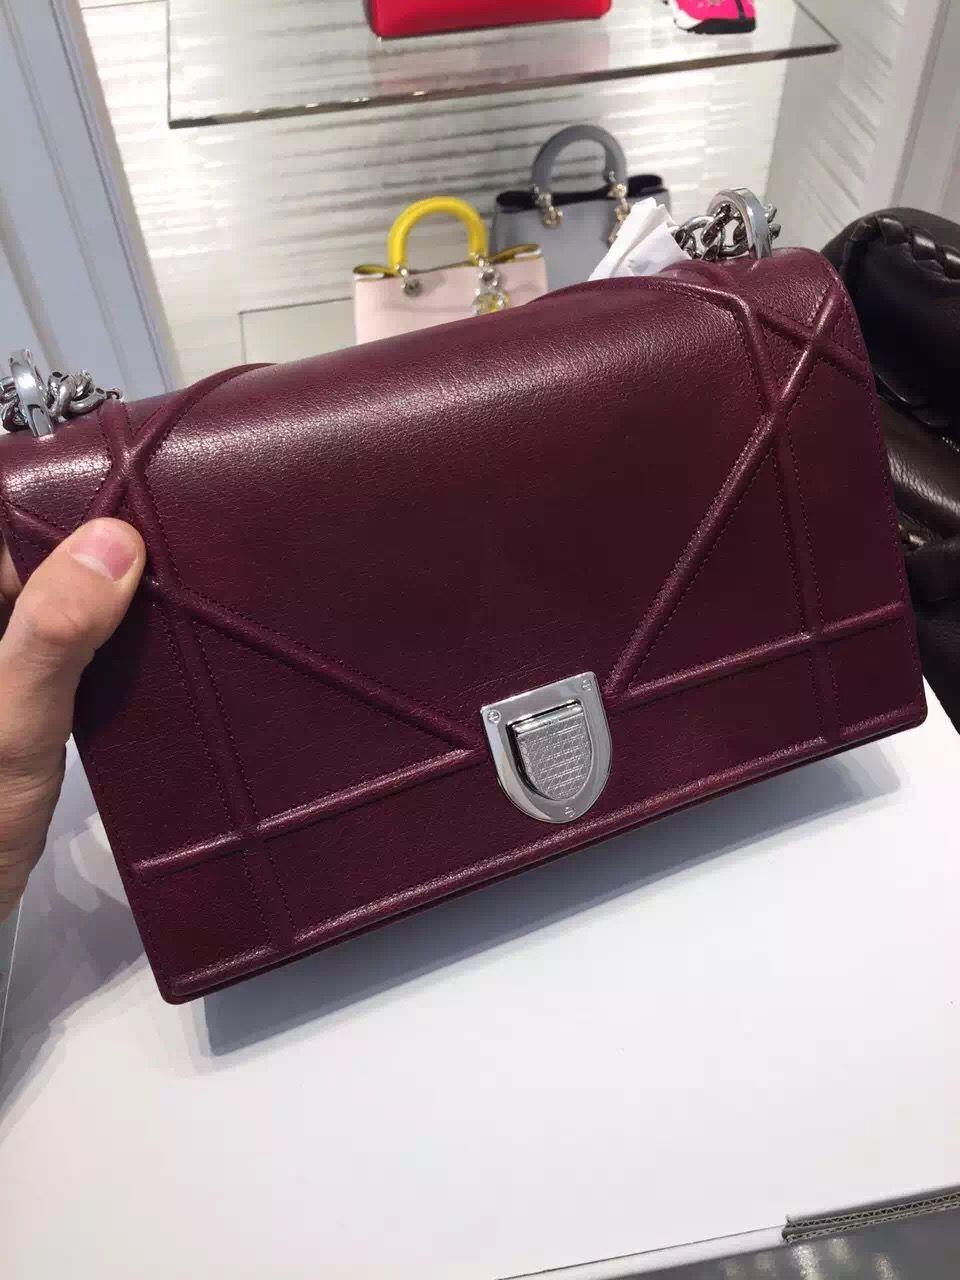 73a2ad71d10d Authentic Dior Diorama Calfskin Shoulder Bag Burgundy | Style | Bags ...